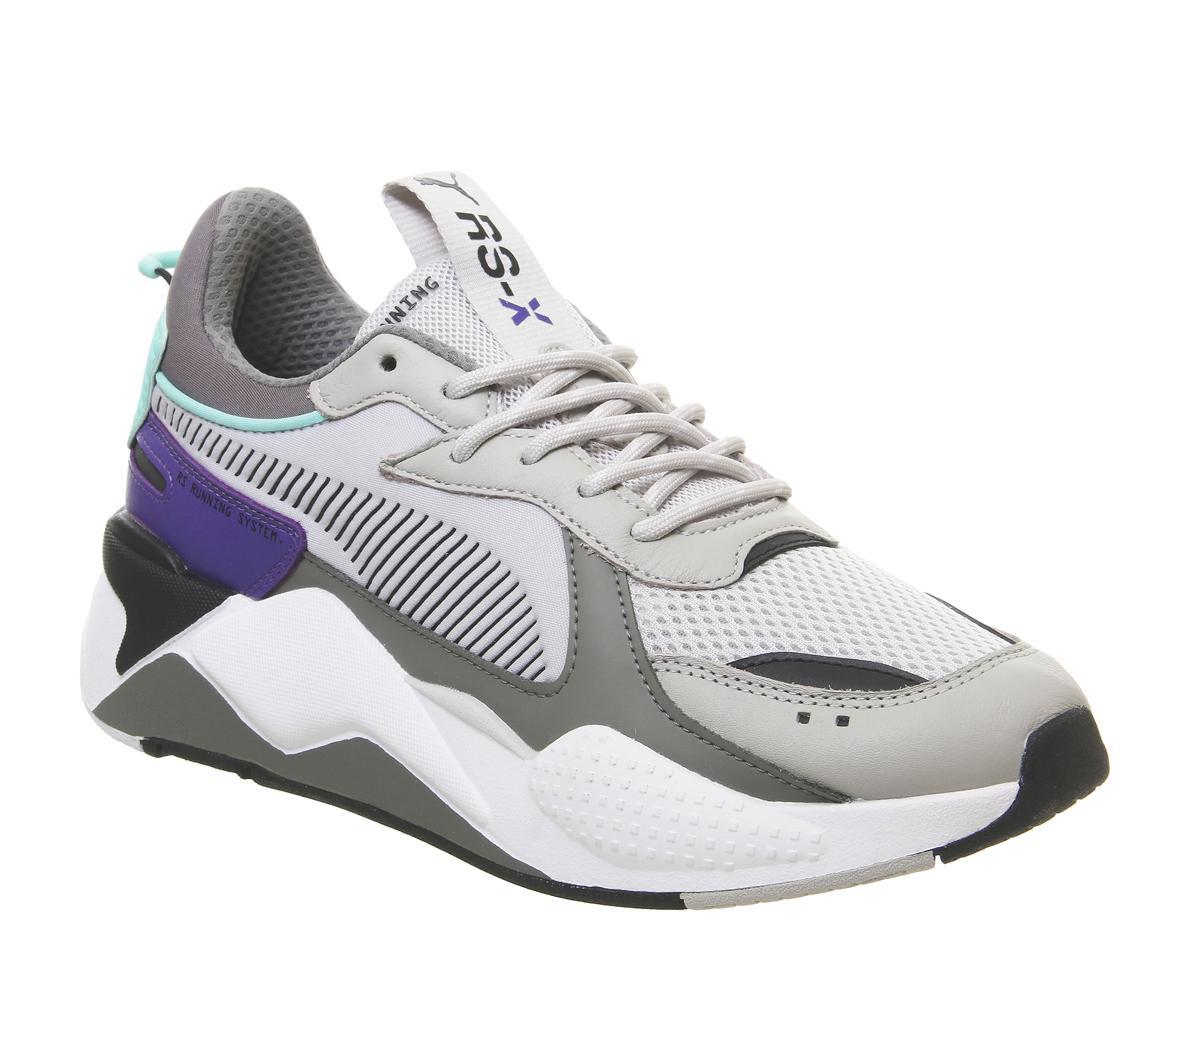 Puma Rs-x Tracks Grey Grey Purple - His